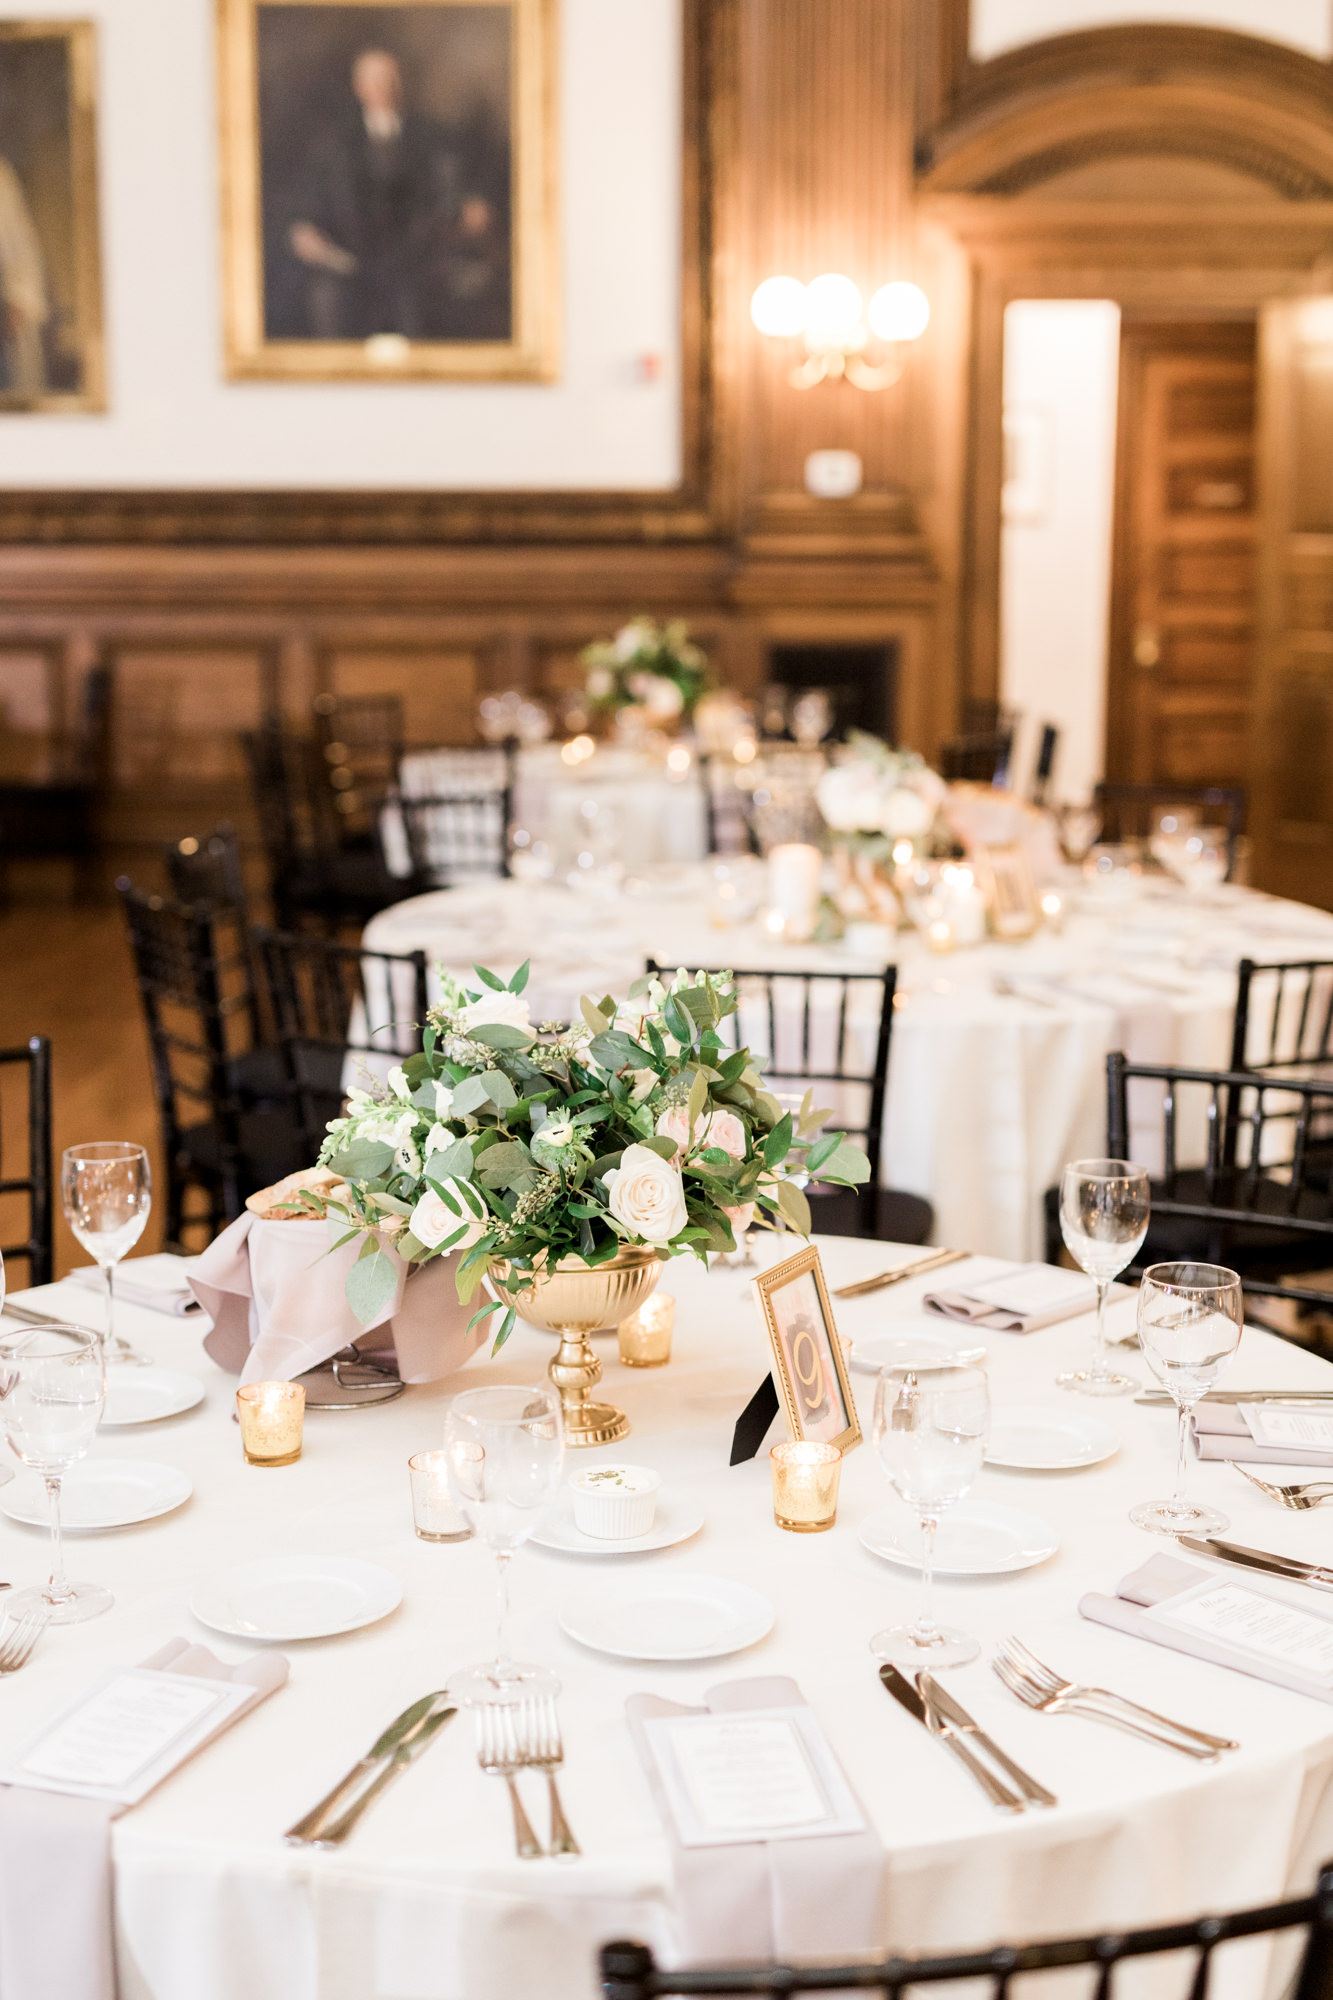 haley-richter-photography-autumn-college-of-physicians-wedding-philadelphia--296.jpg